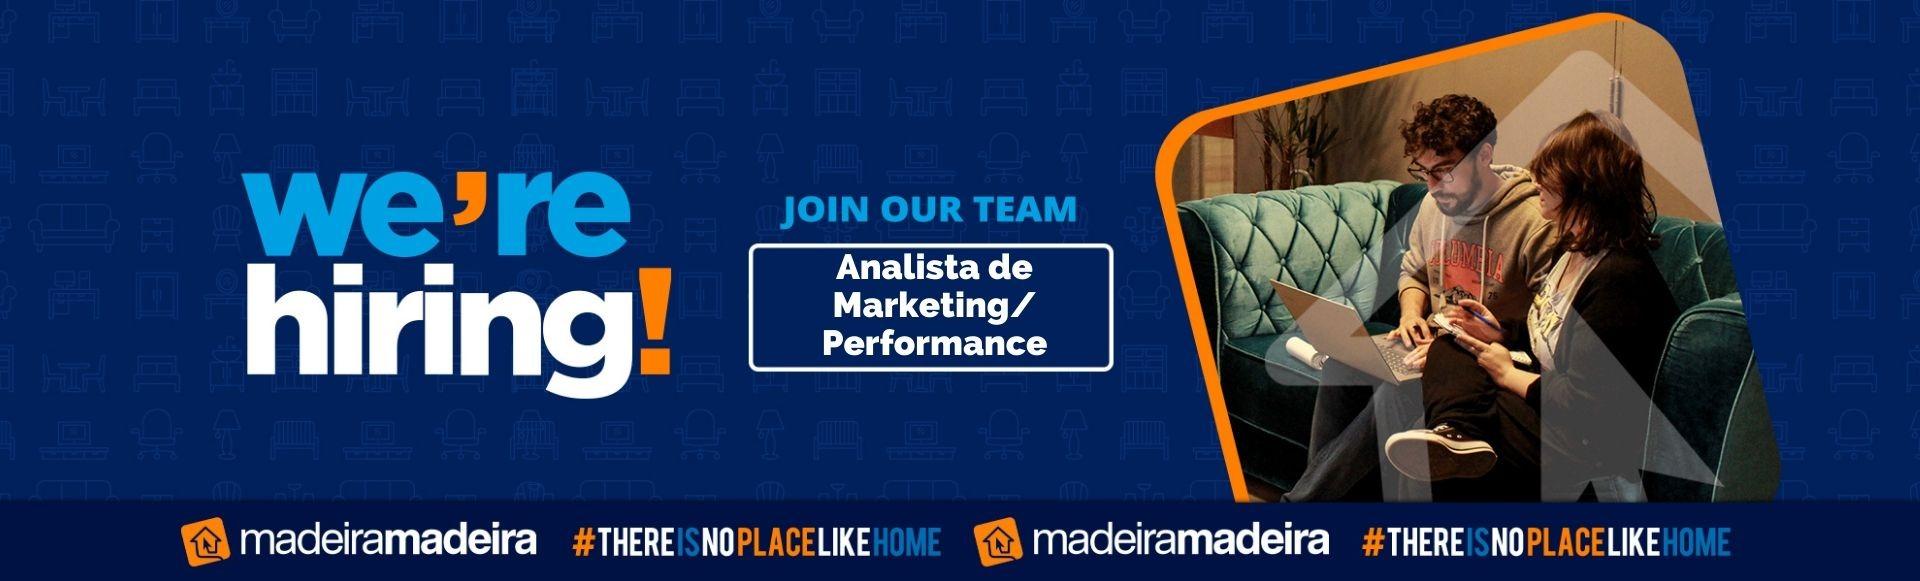 Analista de Marketing/Performance (Foco em Search)